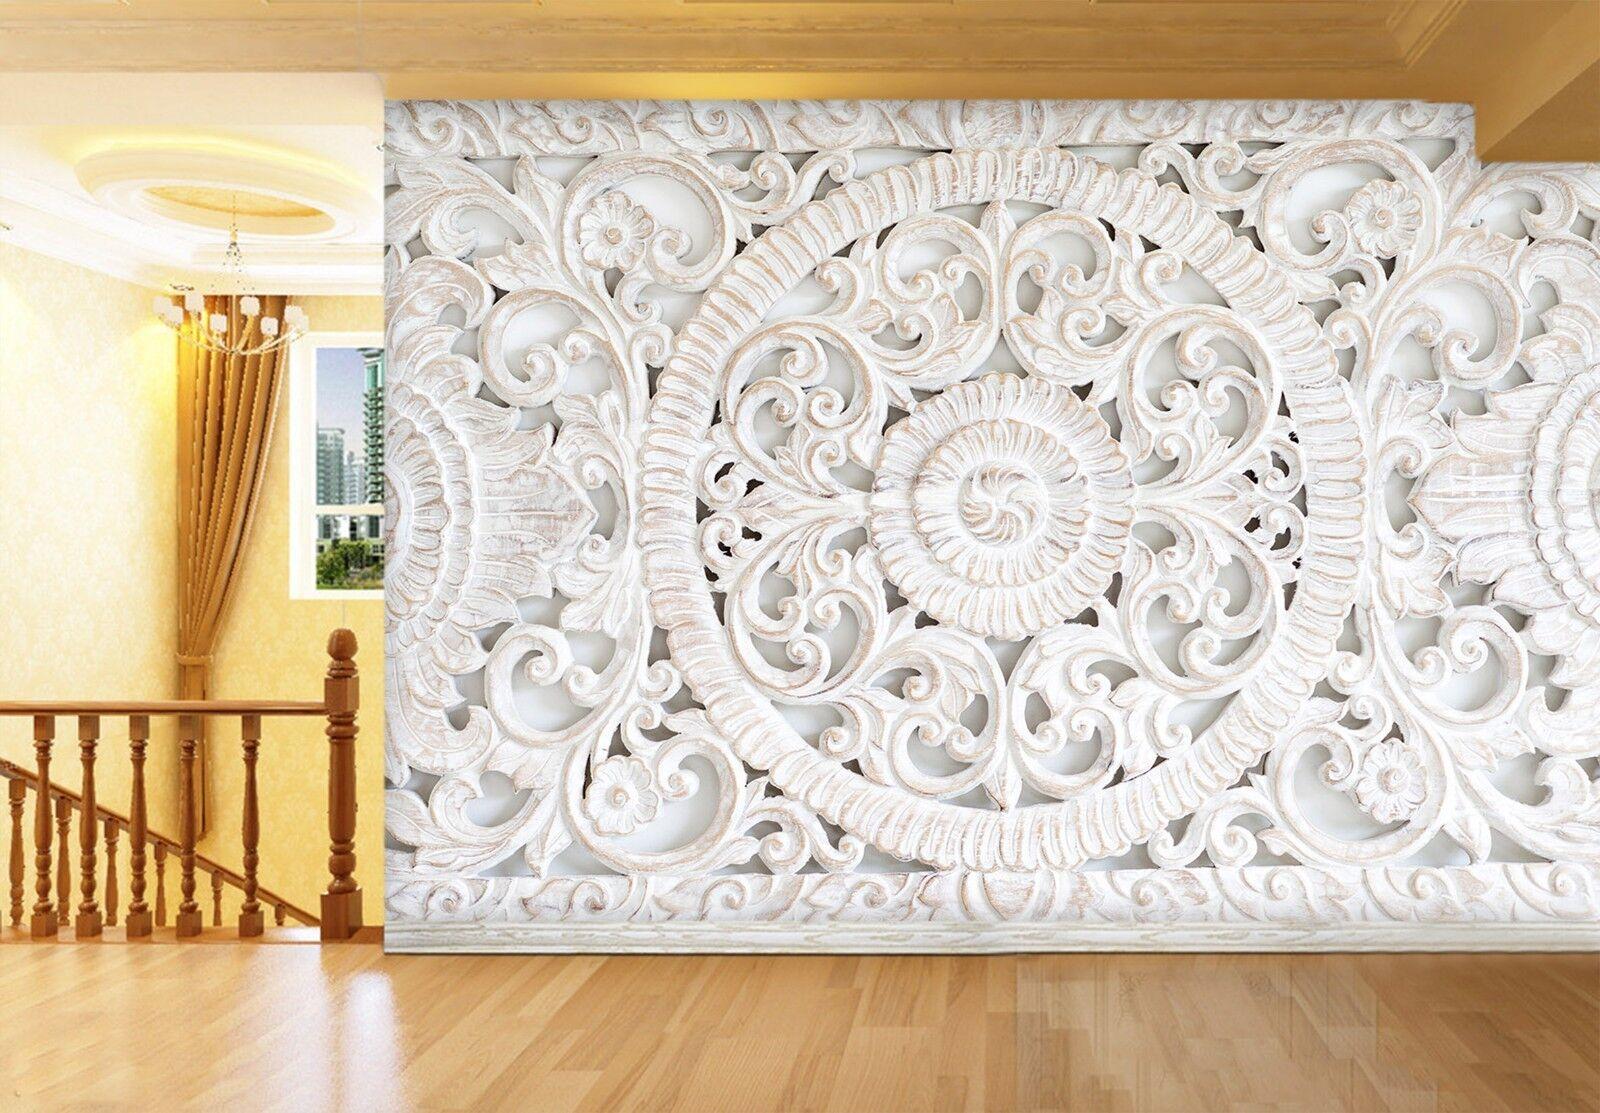 3D Weiß Round Floral 89 Wallpaper Mural Print Wall Indoor Wallpaper Murals UK